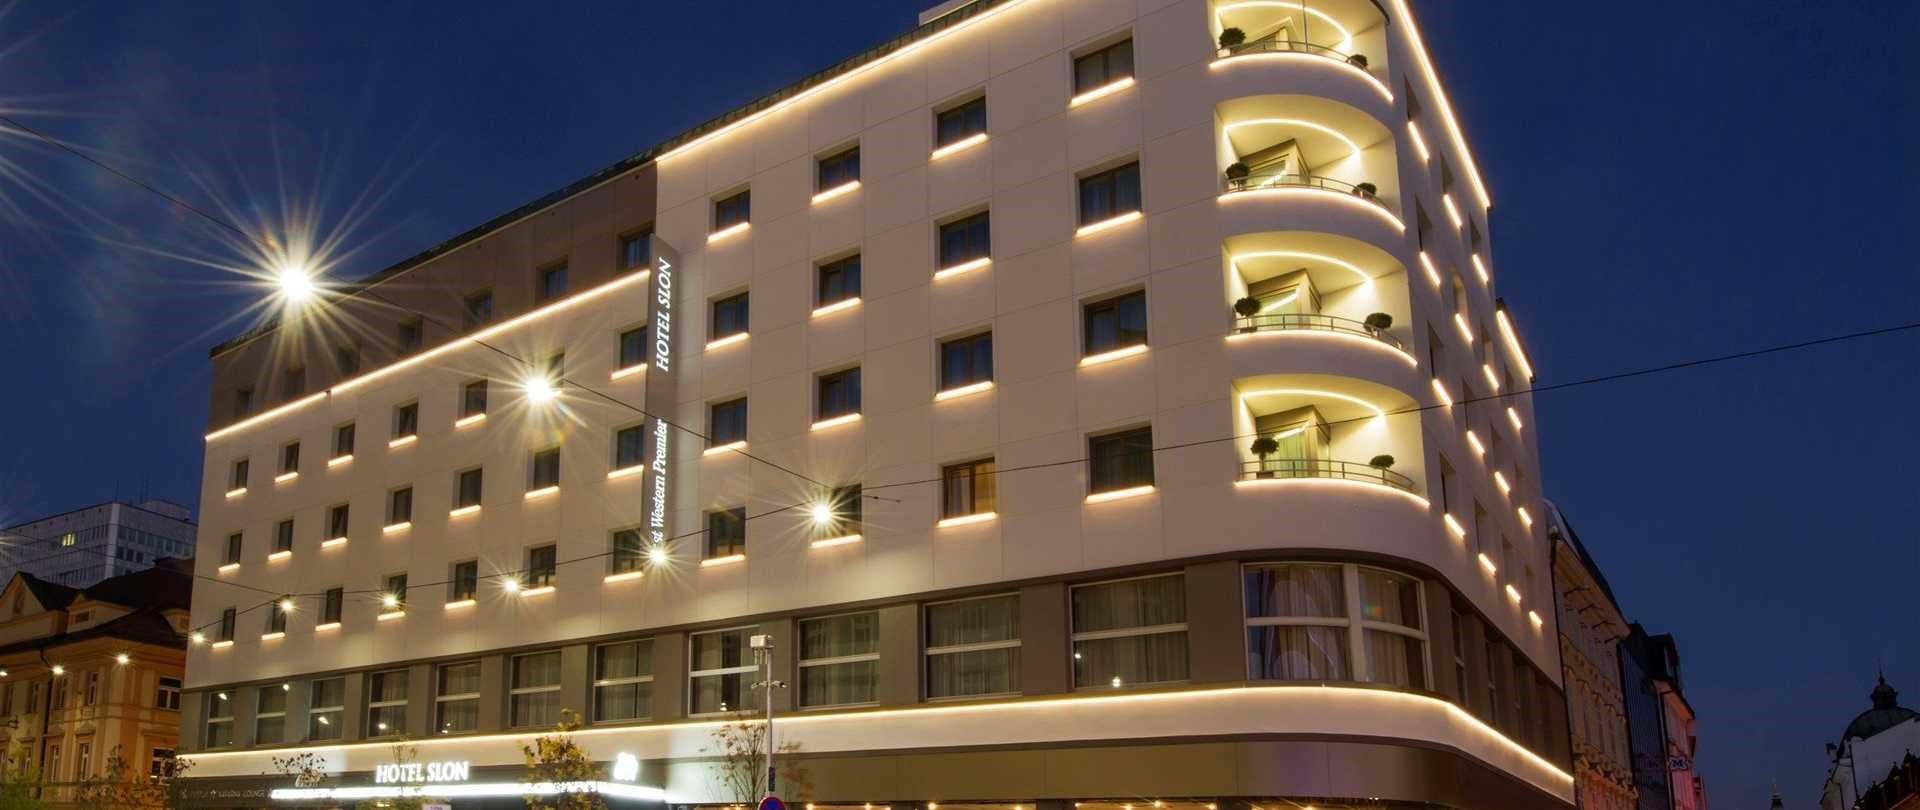 hotelslon